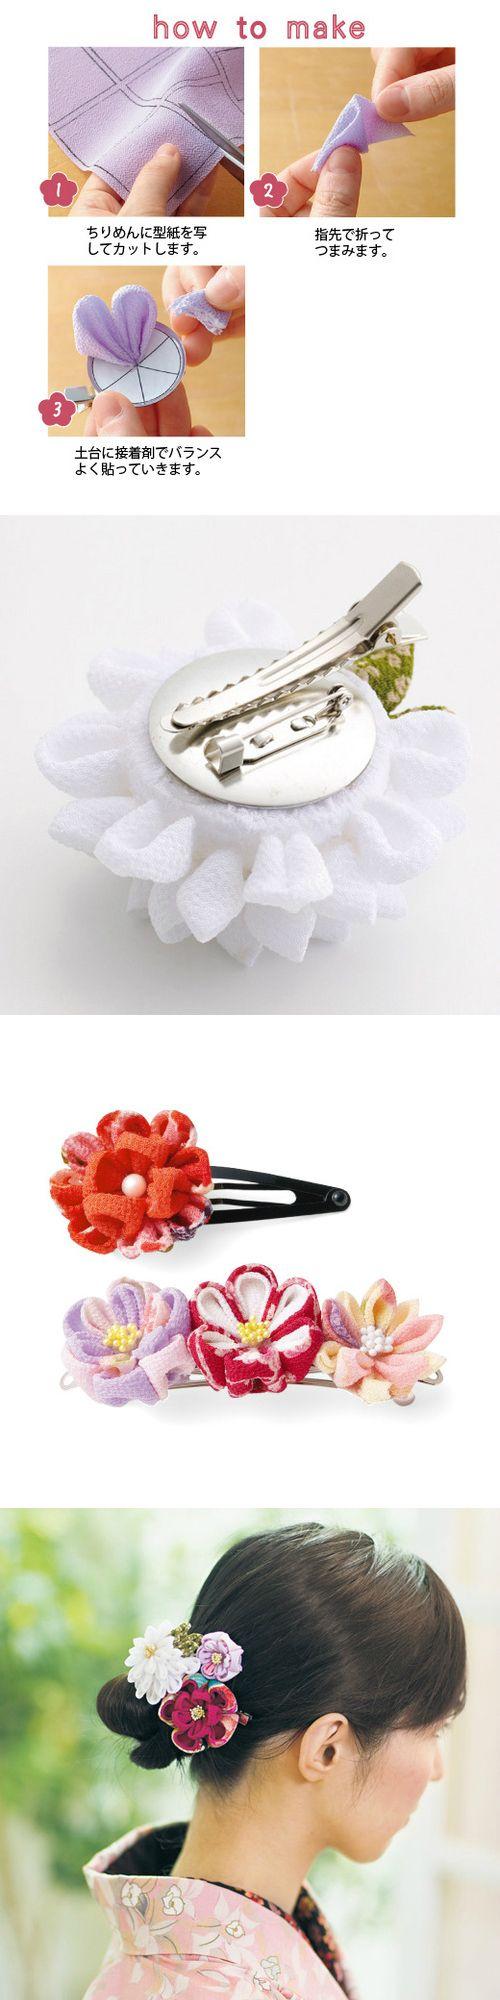 DIY Kanzashi Fabric Flower (Part 2) | ちりめんで形にする和の趣 四季折々つまみ細工のお花の会(12回限定コレクション)zakka collection (JP)